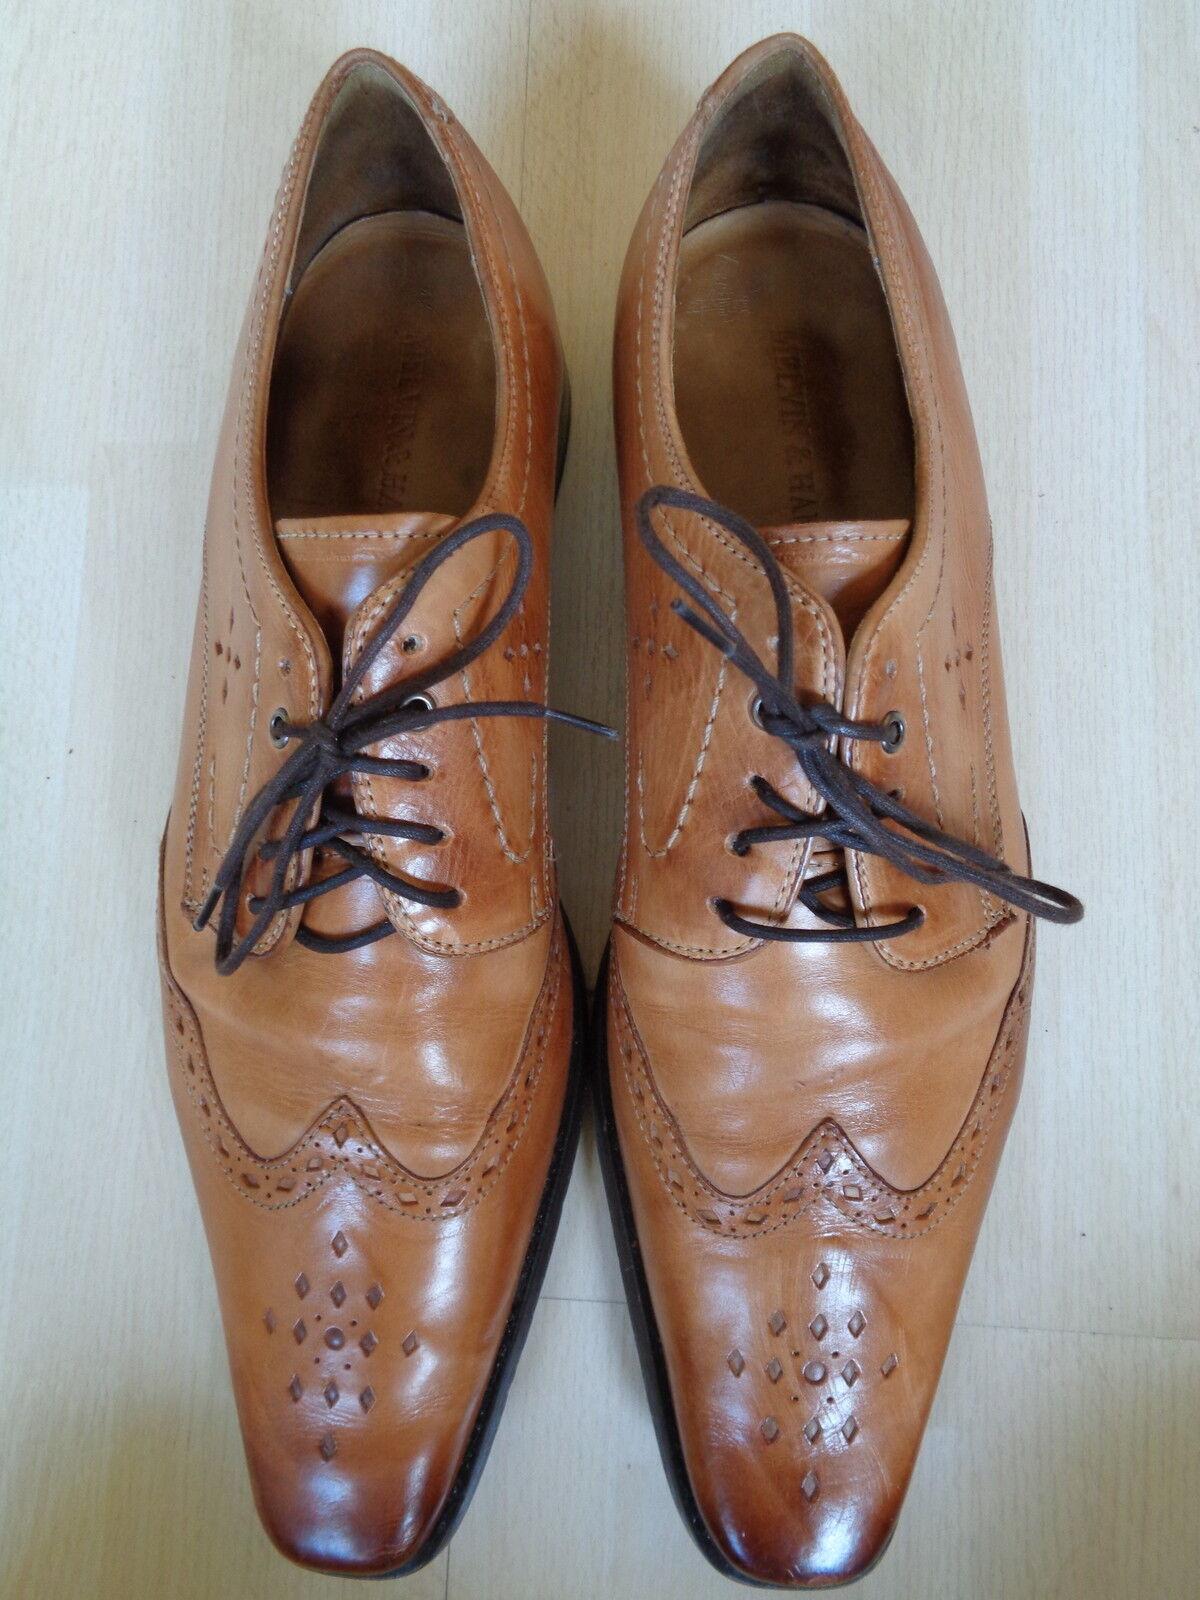 MELVIN & HBMILTON  Leder Buisness Schuhe Gr.44  in Cognac